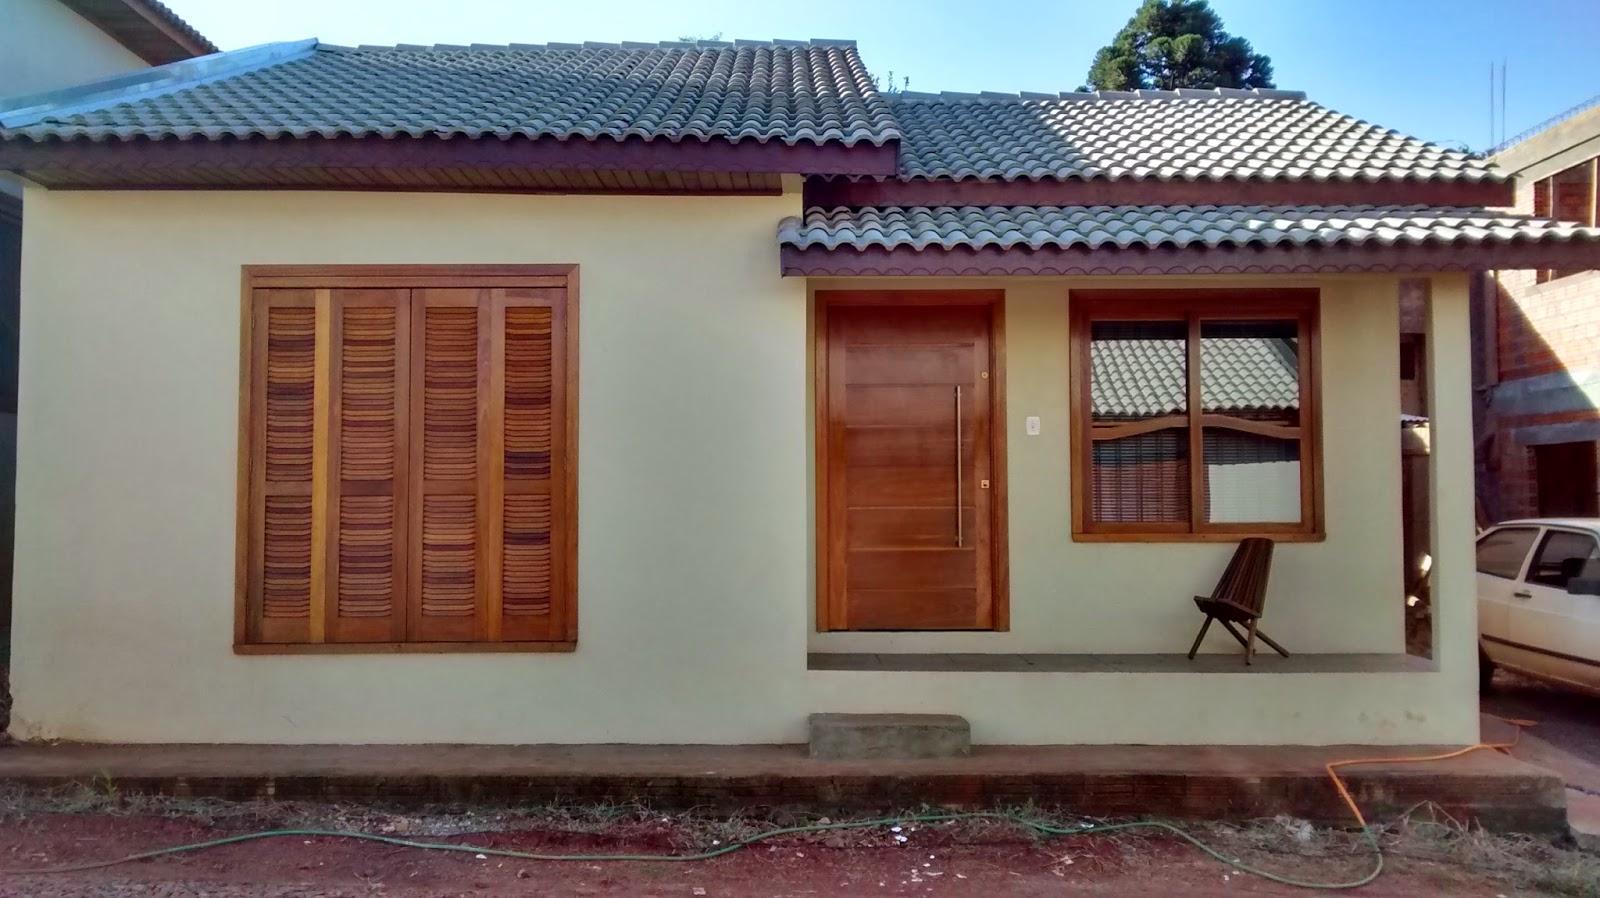 IMOBILIARIA BELLA CASA IMOVEIS Rua Dumoncel Filho n° 1273 Centro  #0B72C0 1600 898